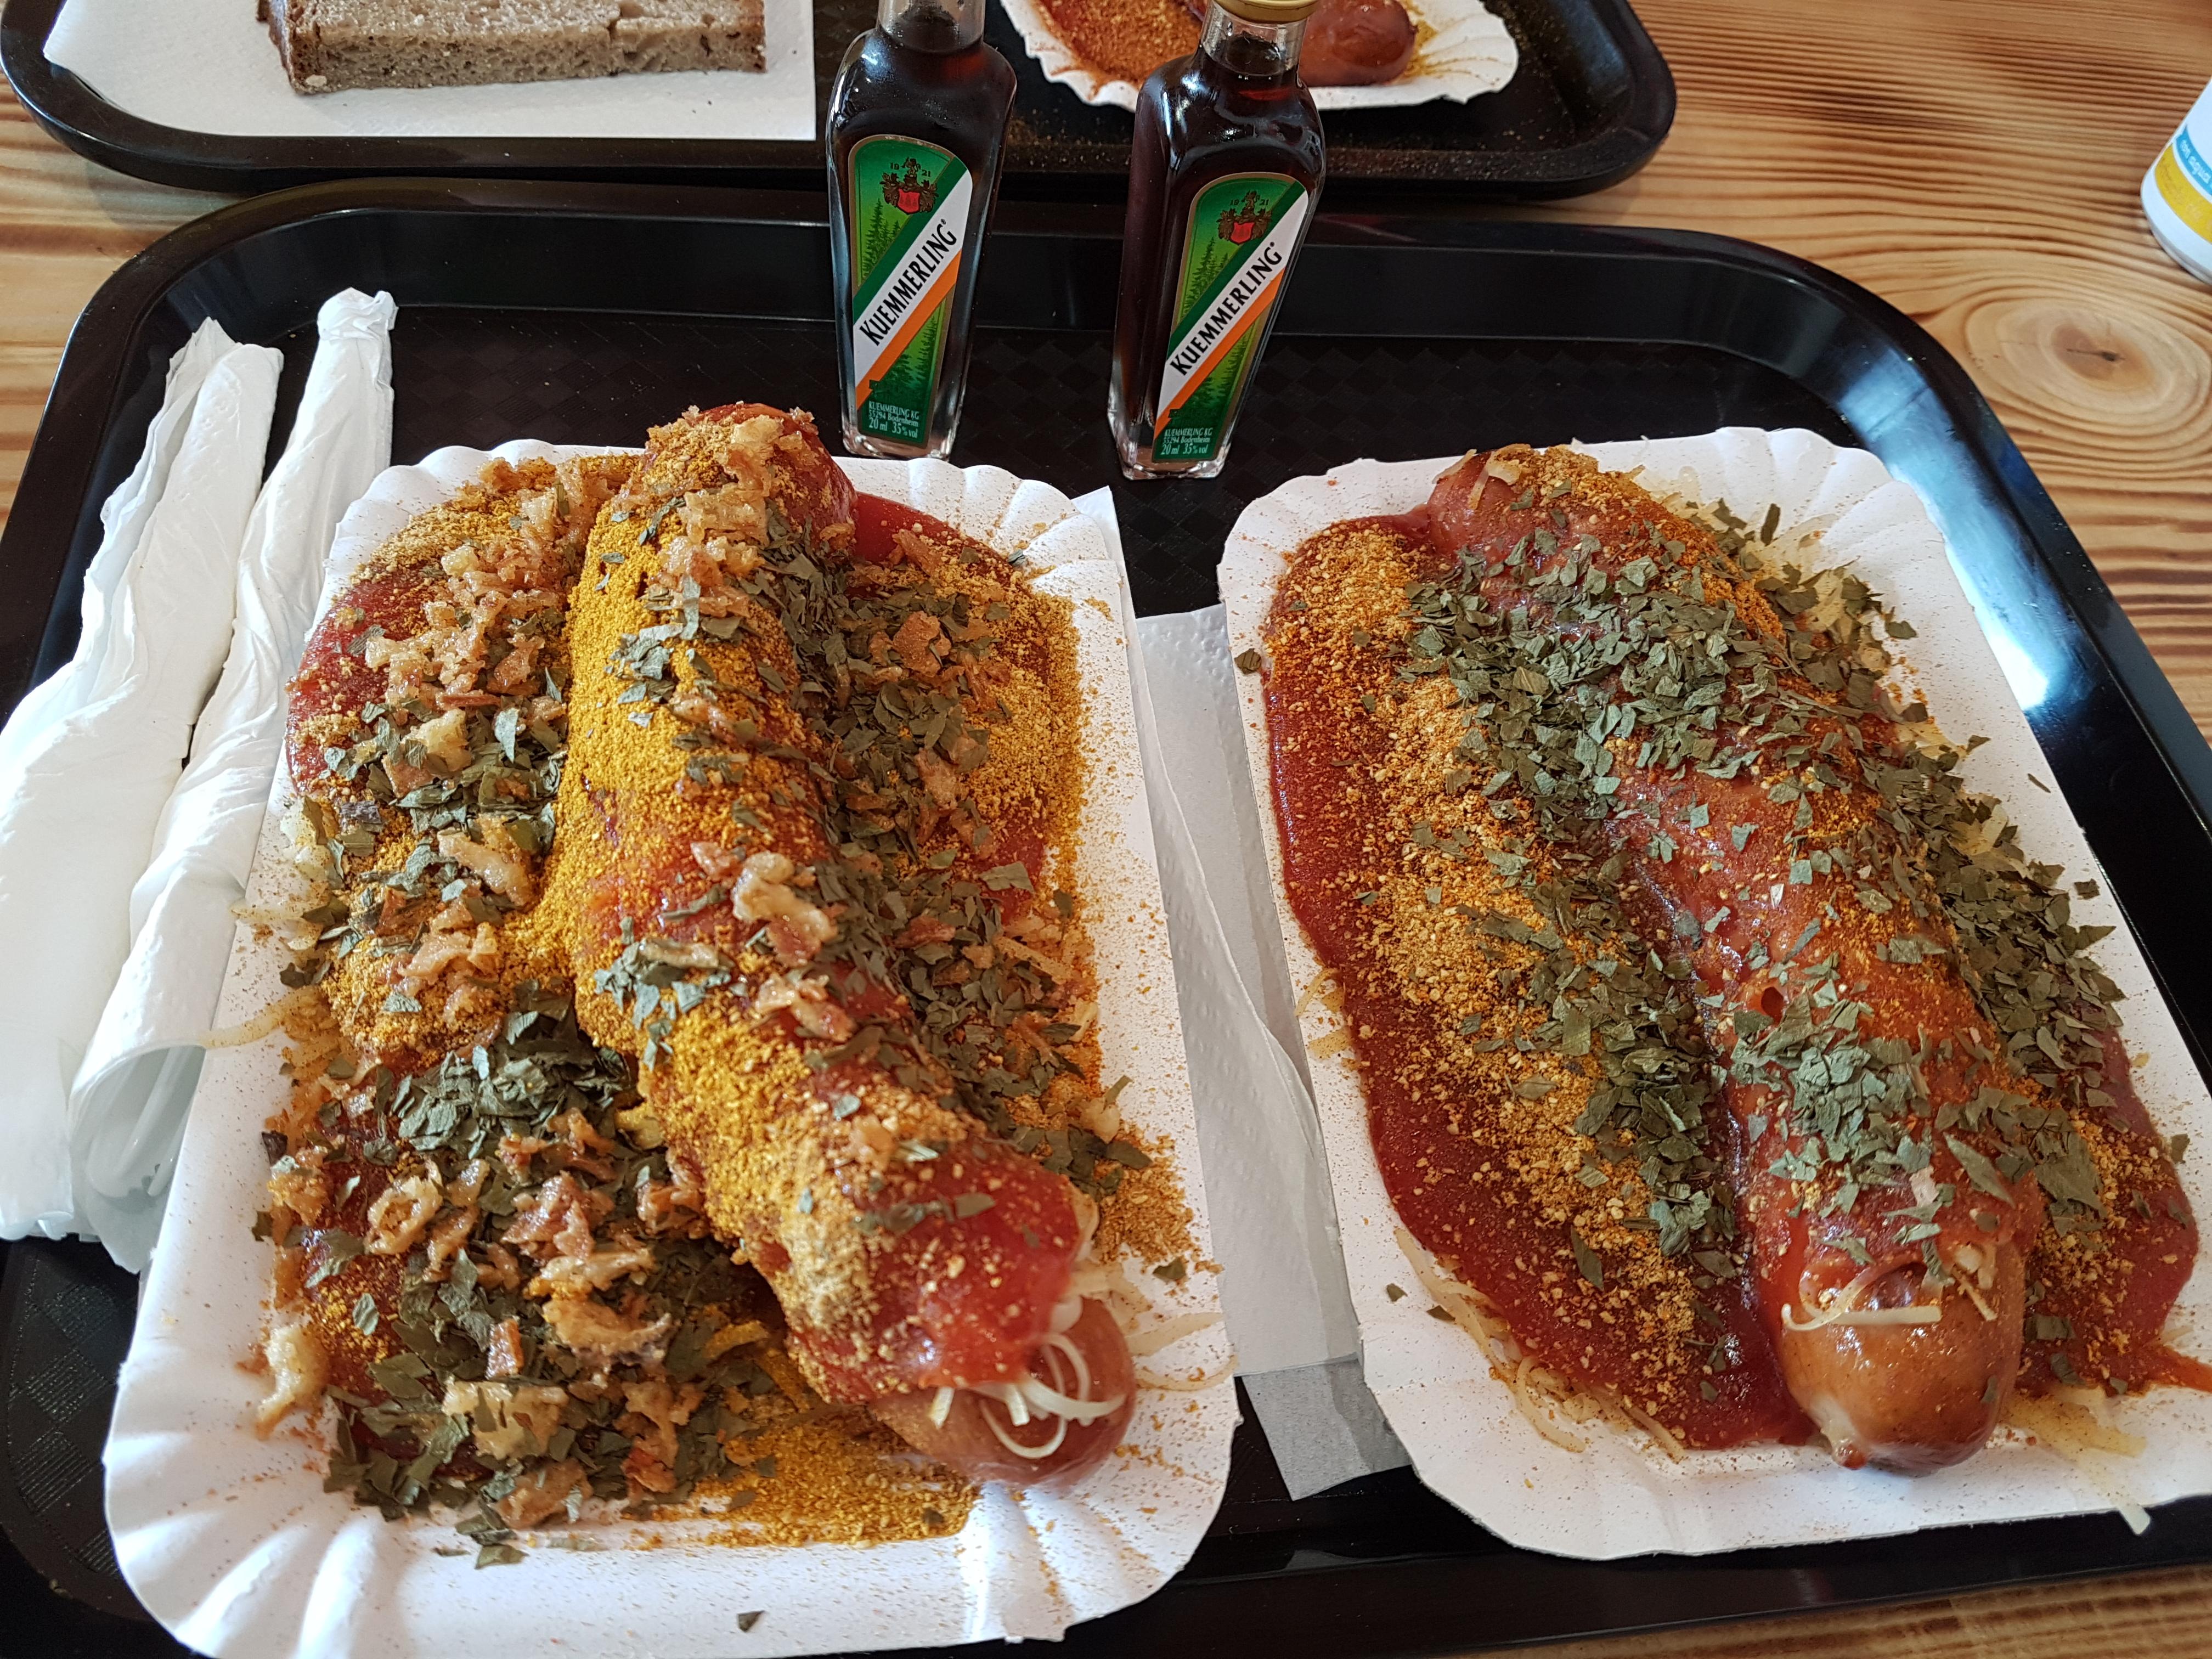 https://foodloader.net/Holz_2018-04-20_DJ_Duese_Wurst.jpg